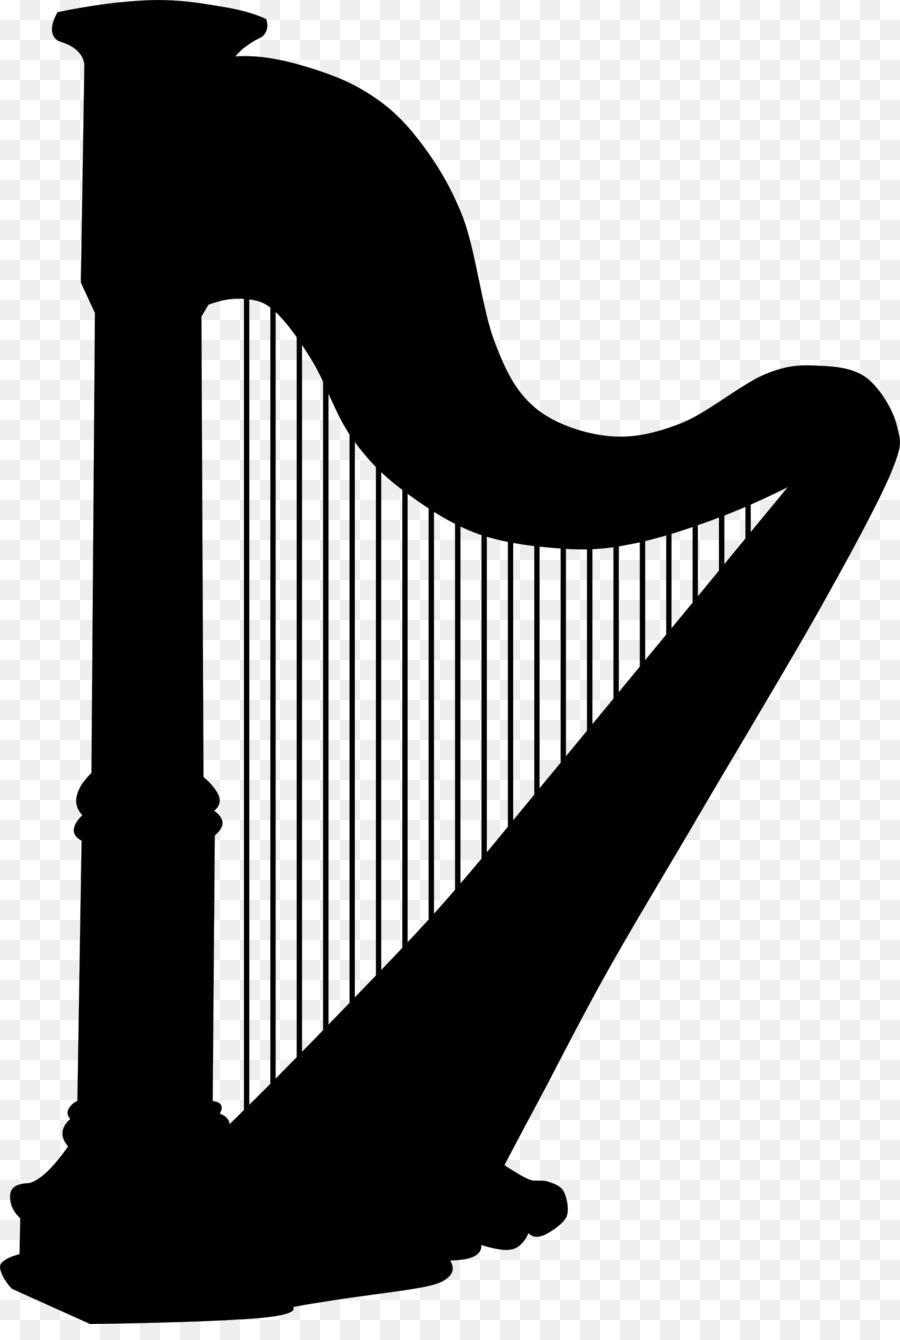 Clip art line silhouette. Harp clipart